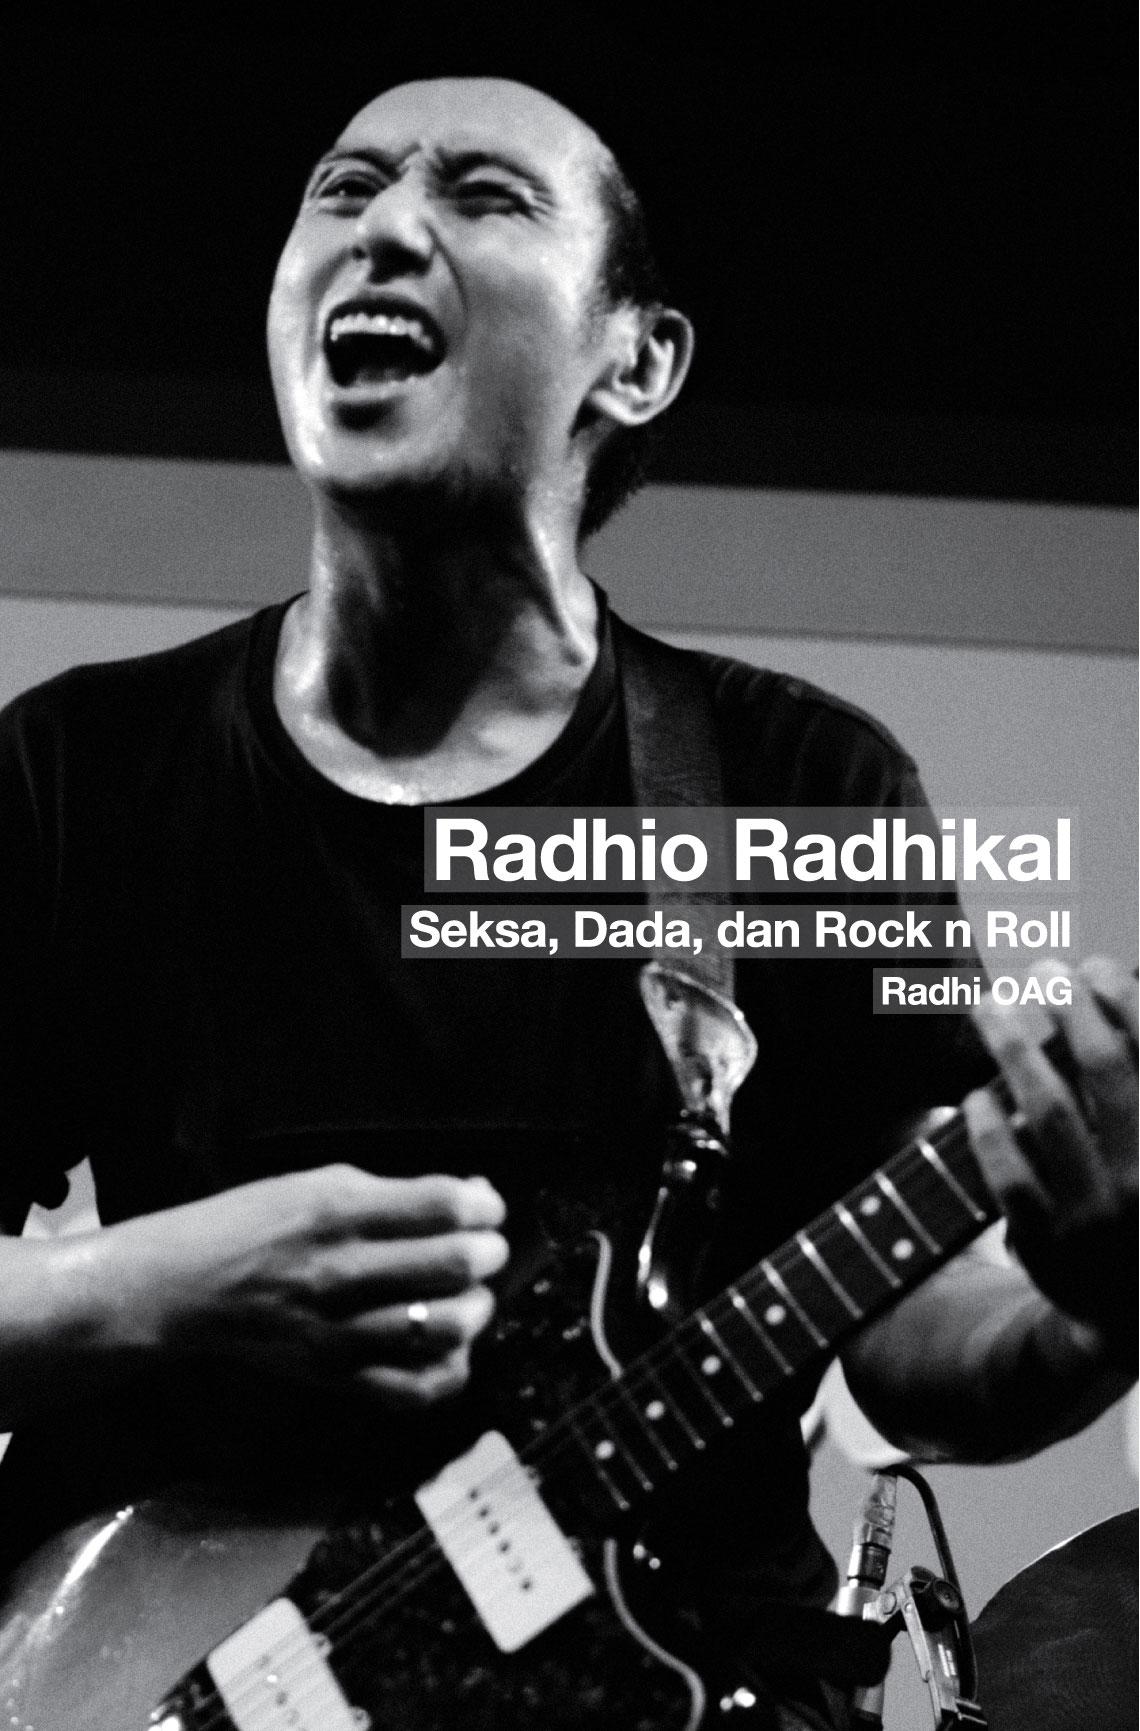 Radhio Radhikal: Seksa, Dada, dan Rock n Roll – Radhi OAG